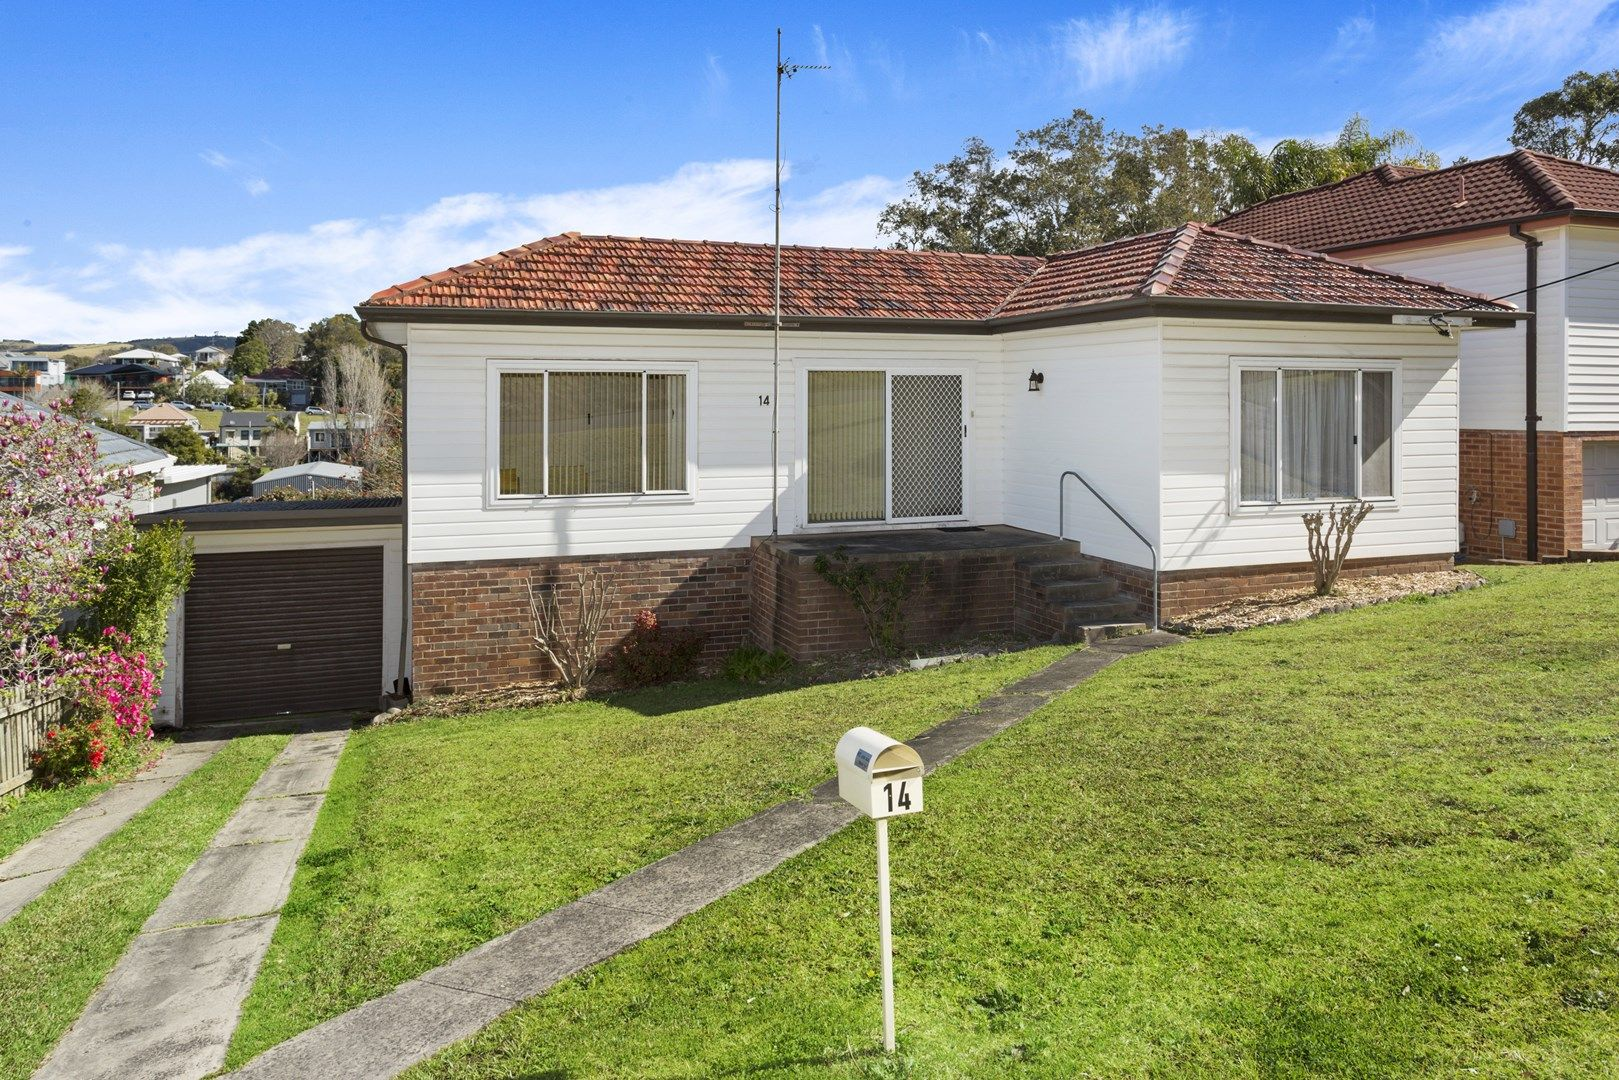 14 Noorinan Street, Kiama NSW 2533, Image 0